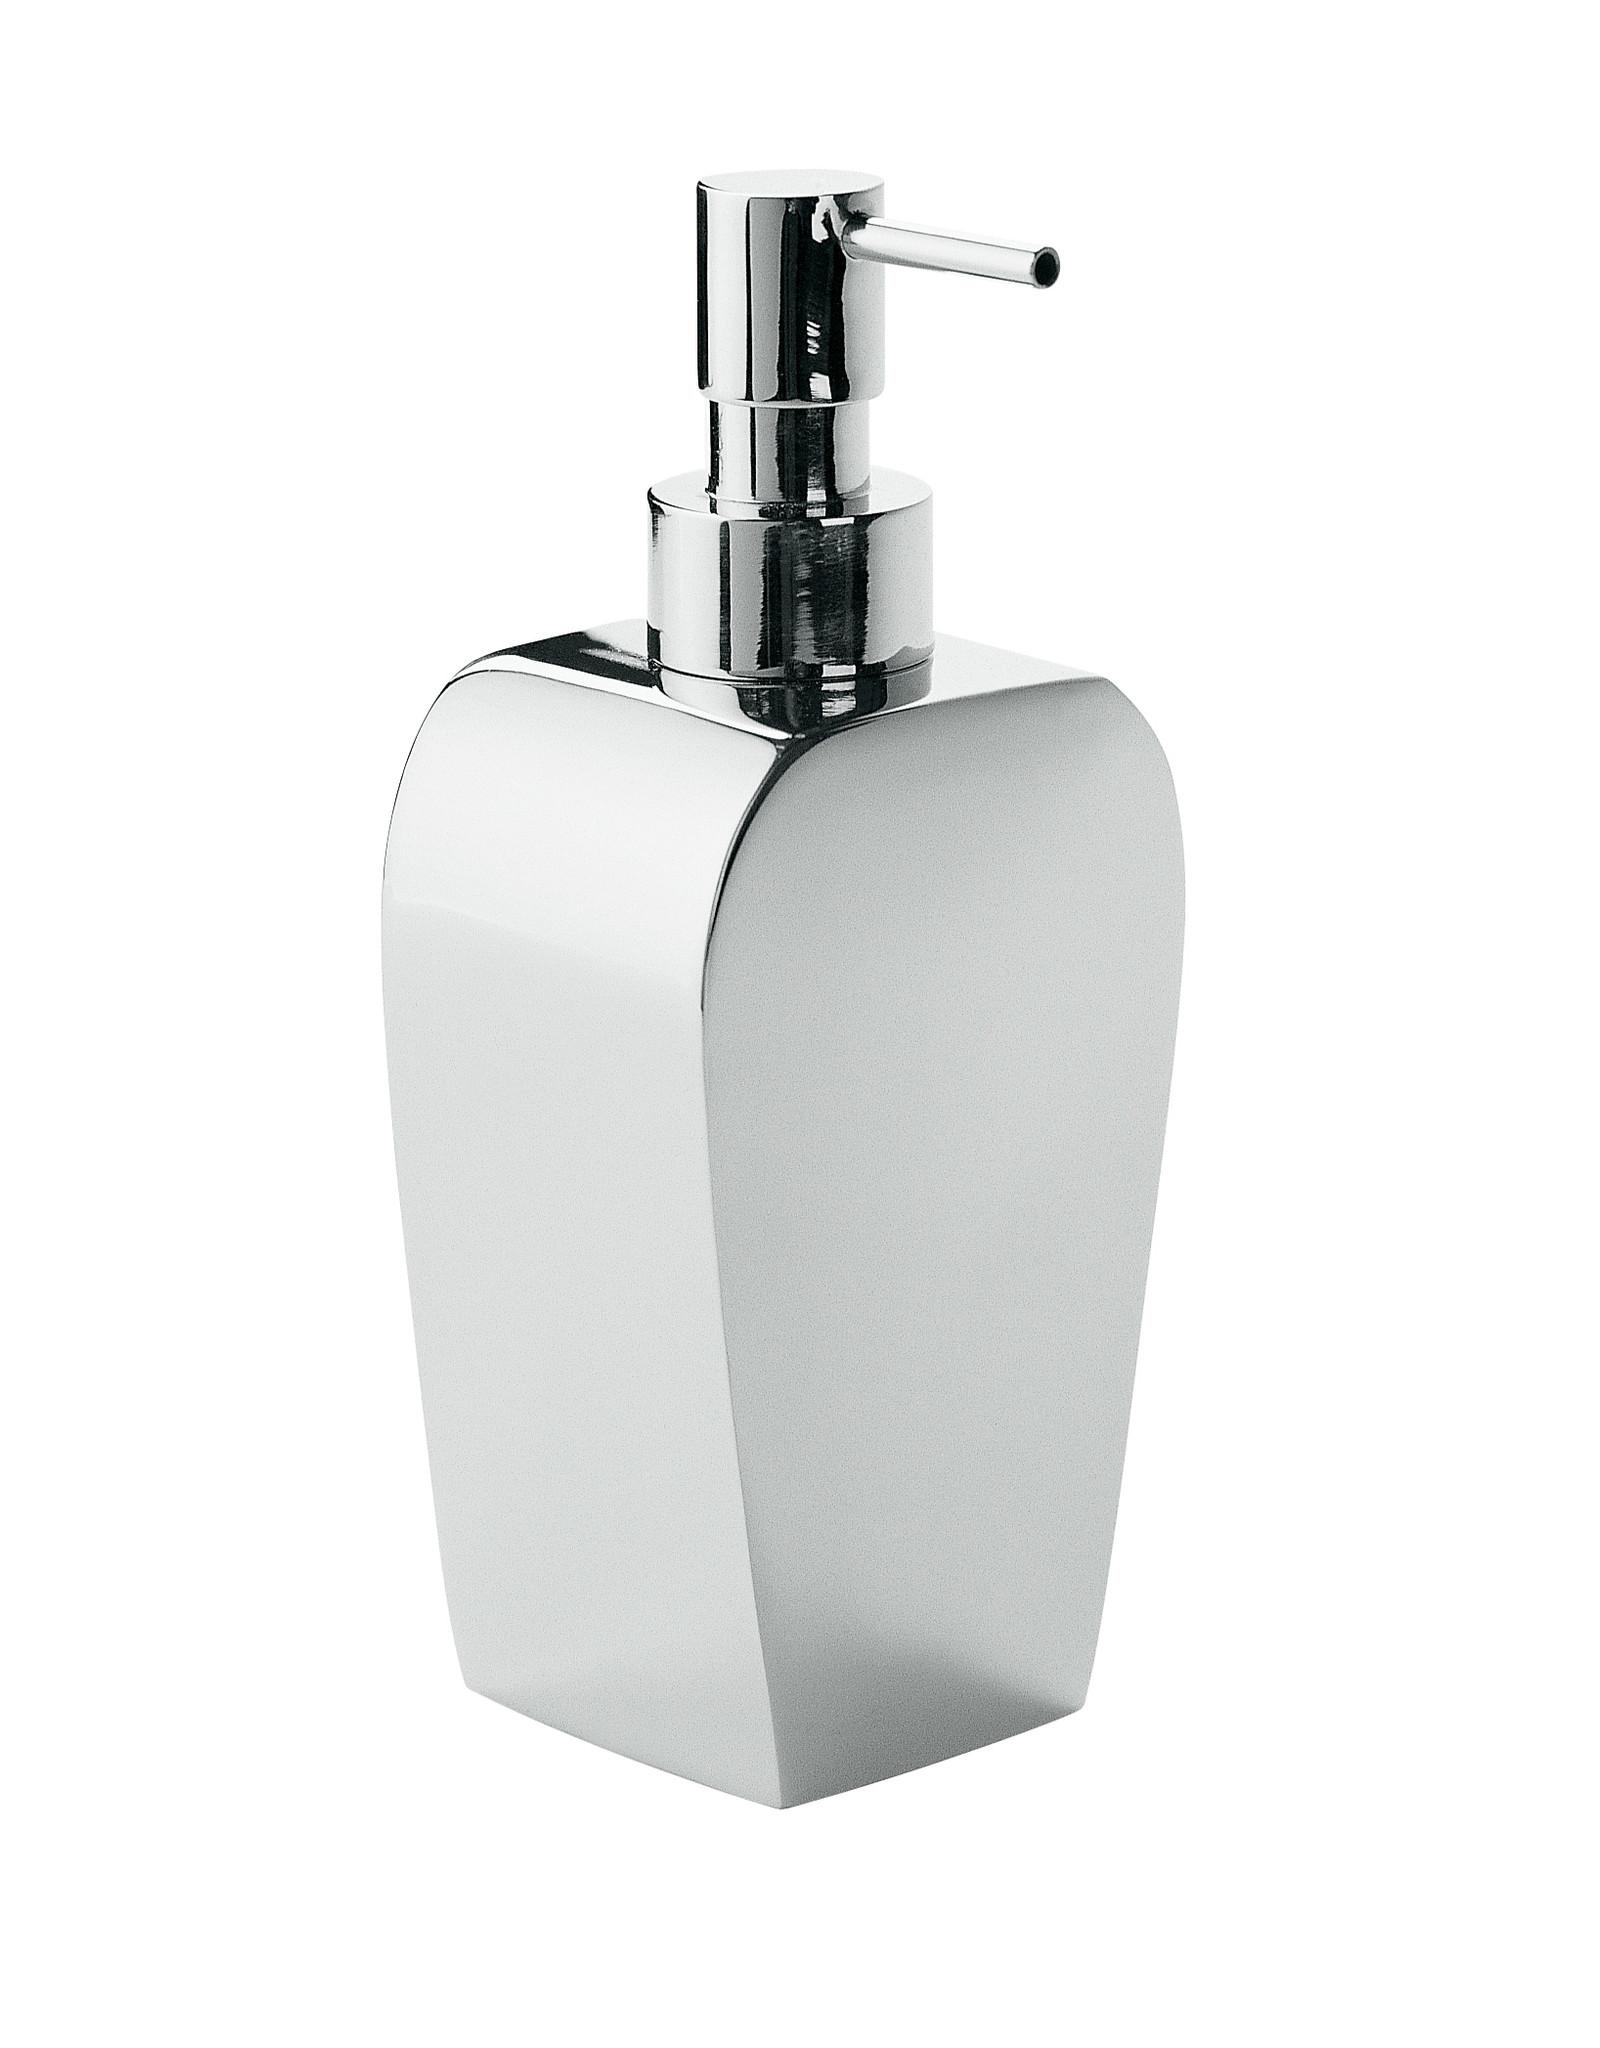 Saon soap dispenser 17,5cm, freestanding - outlet